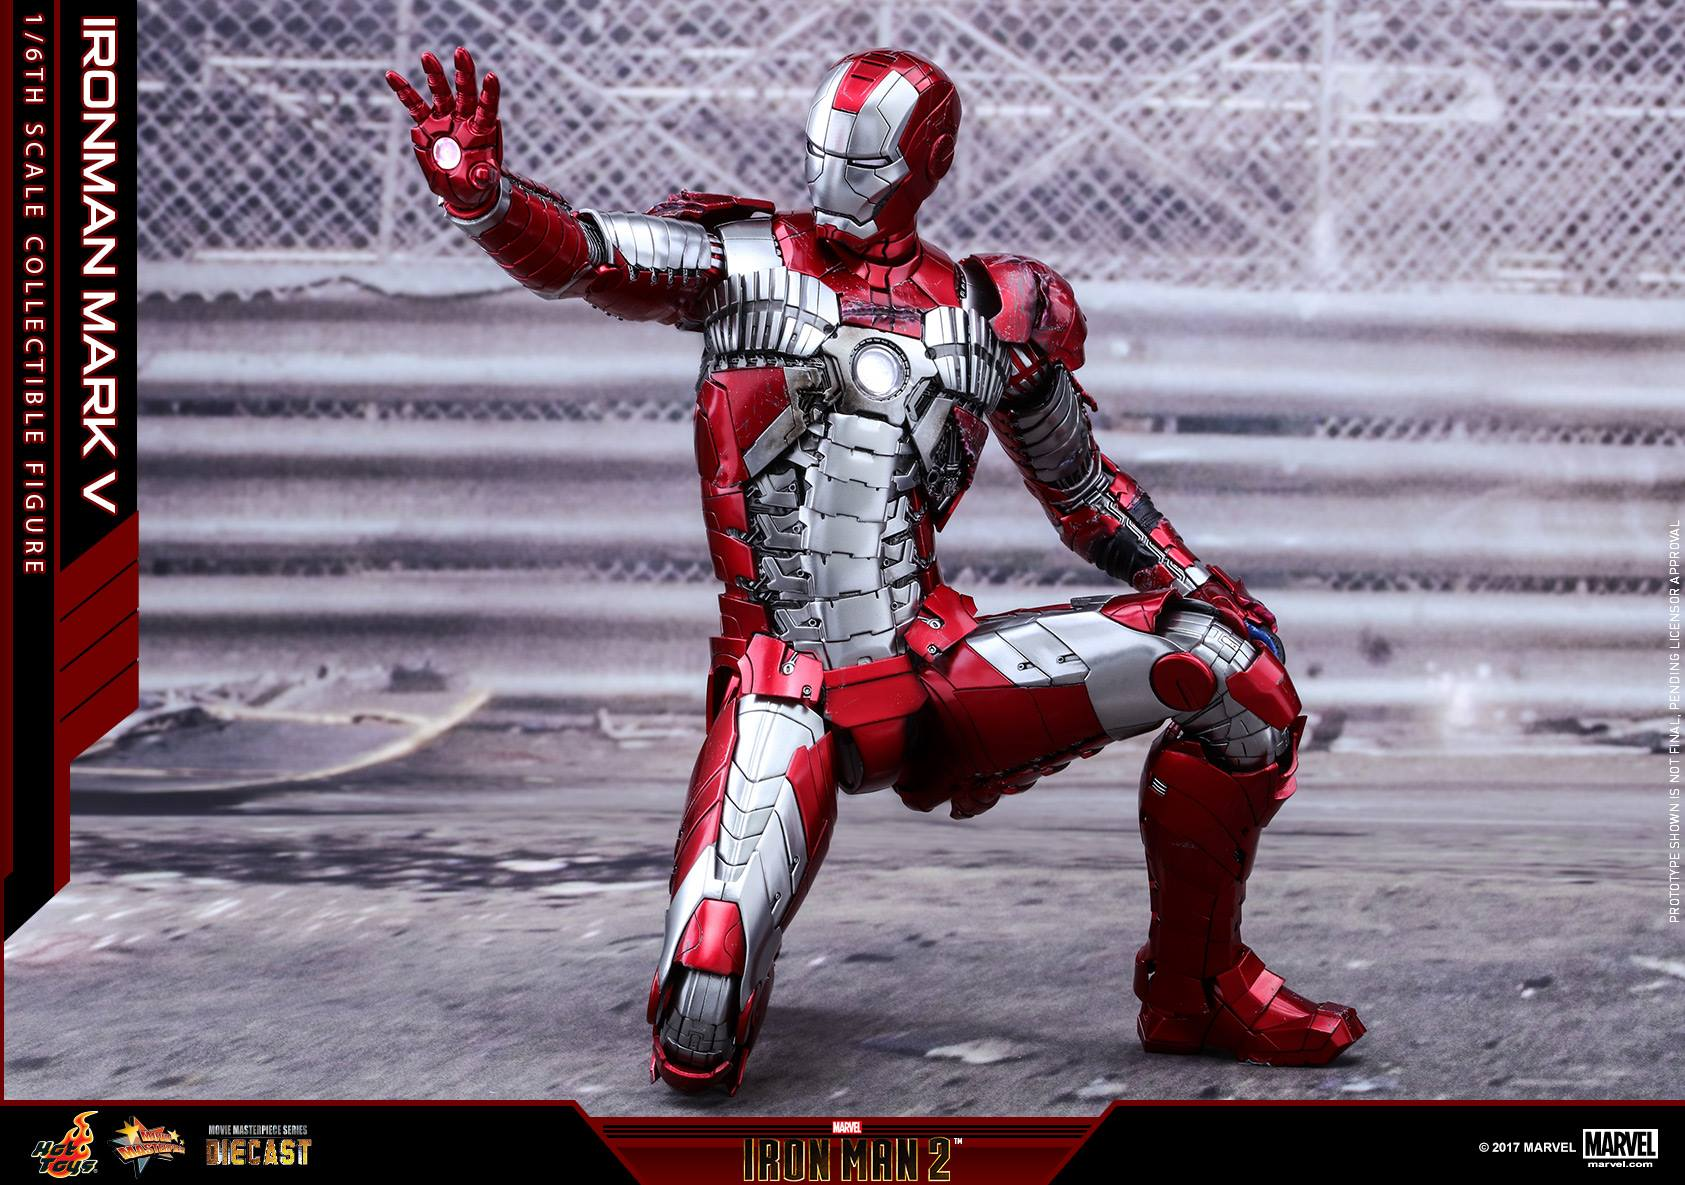 Hot Toys Iron Man Mark V Diecast Sixth Scale Figure